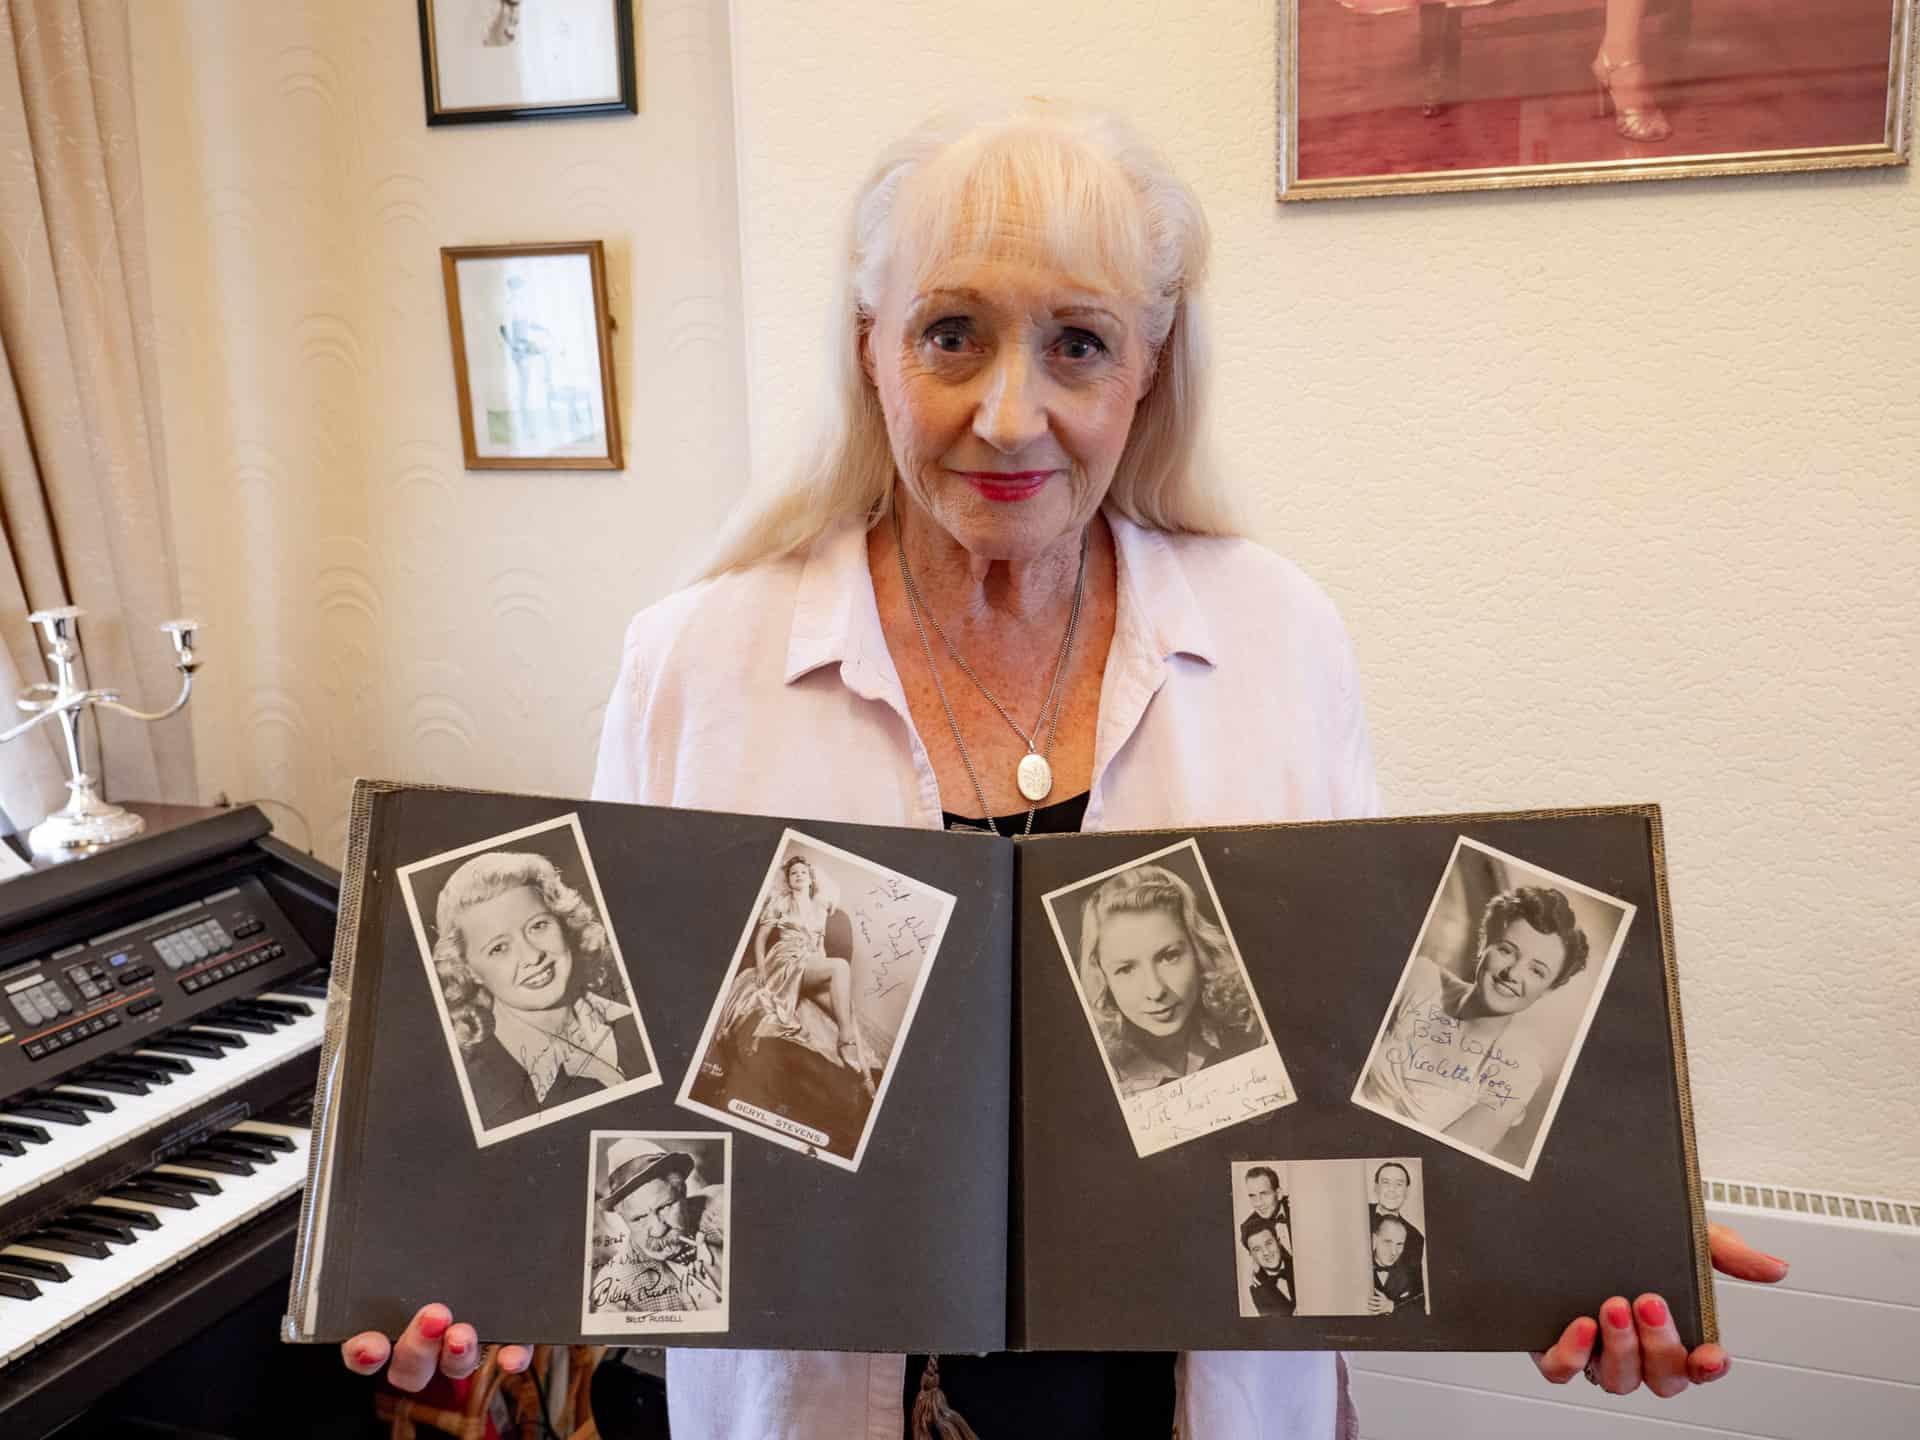 Veronica holding Bert's treasured album.